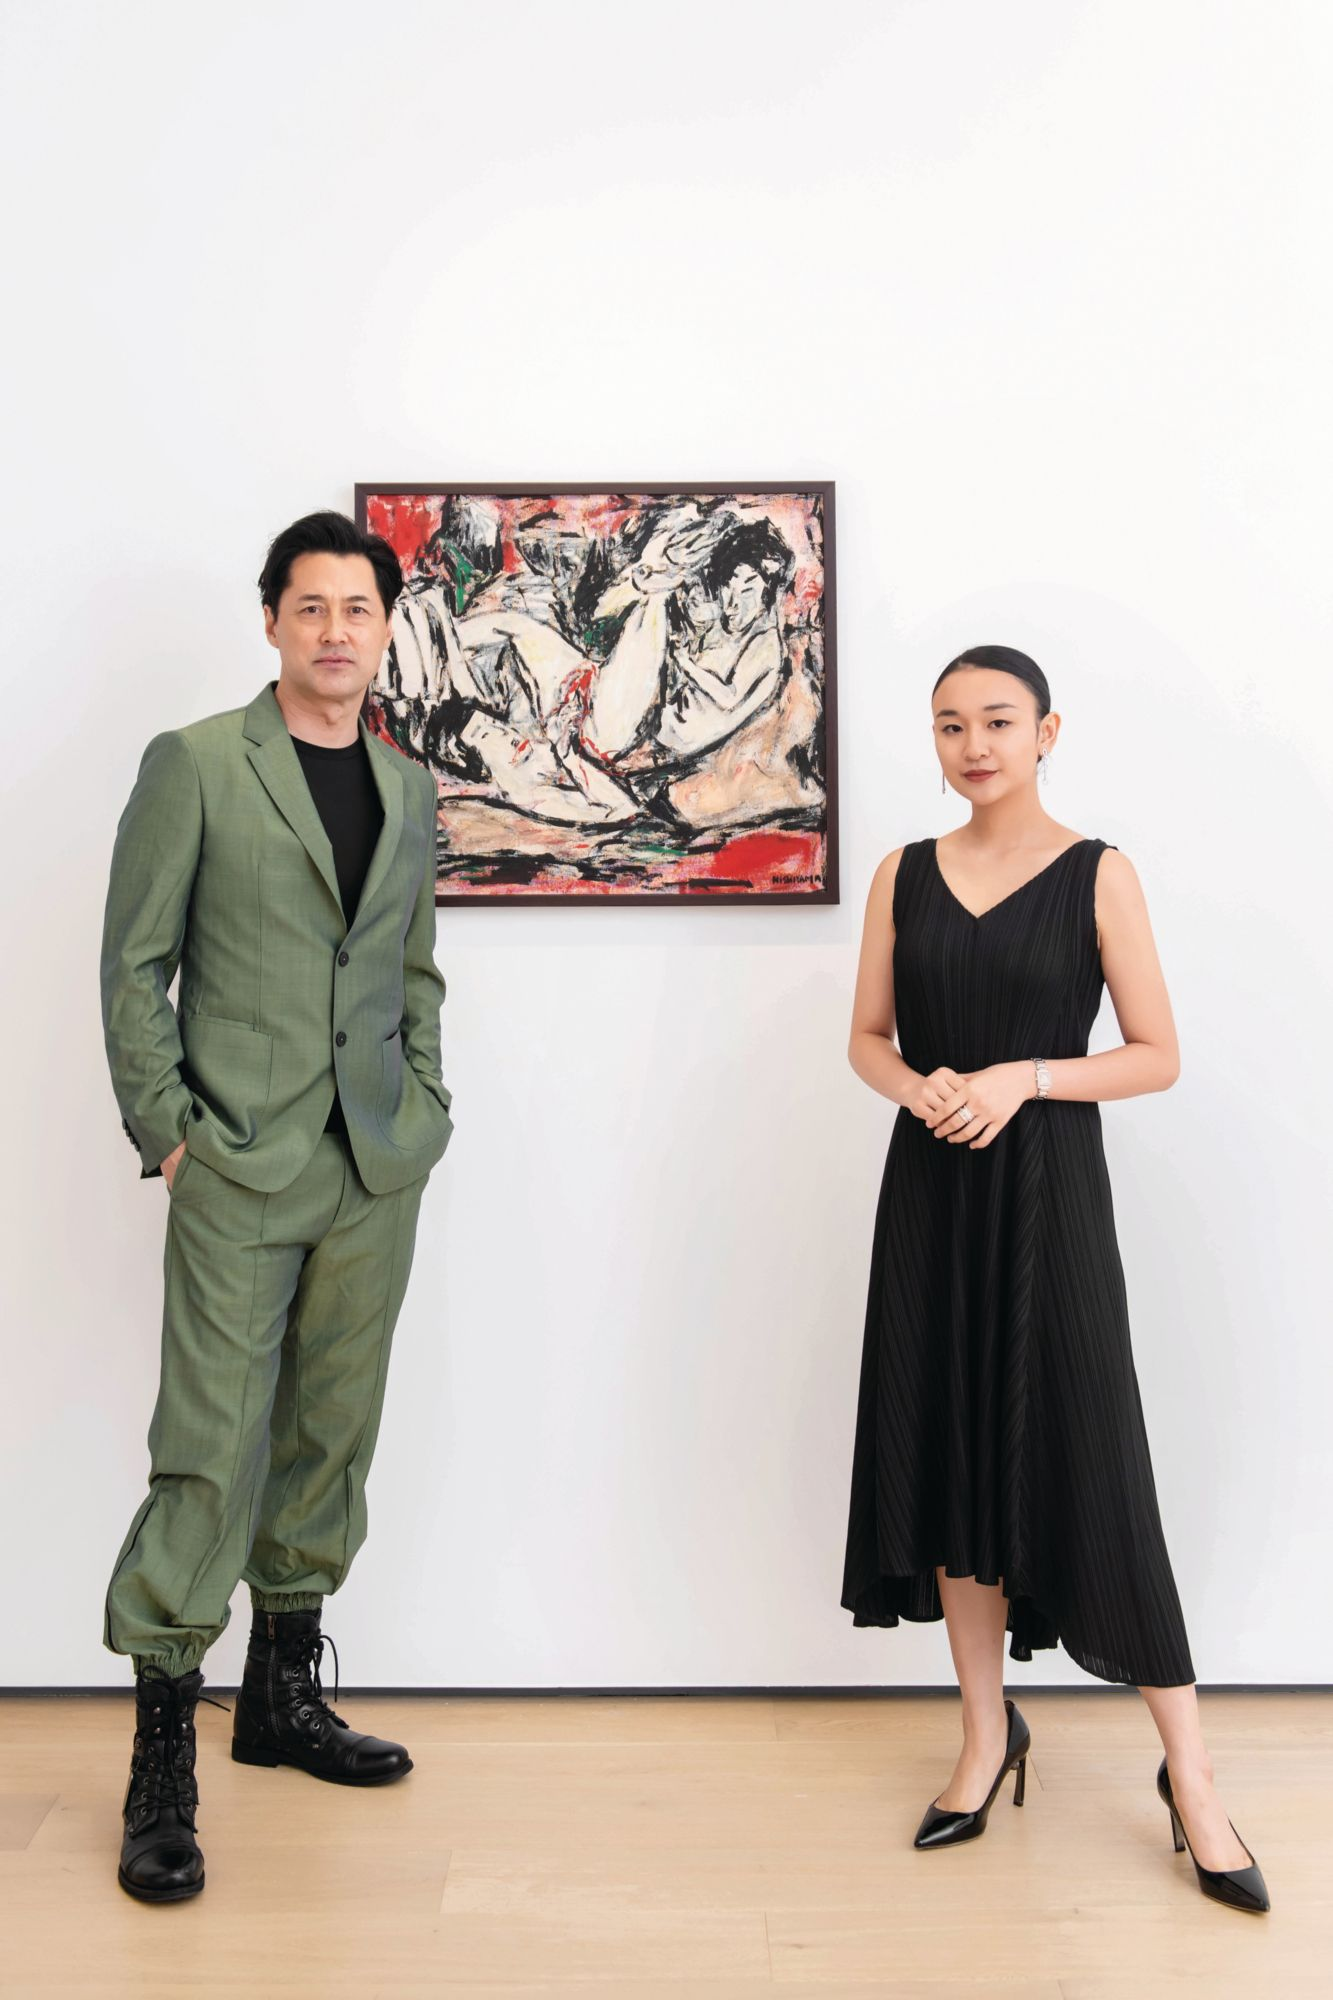 Michael Wong And Mizuki Nishiyama Launch An Art Exhibition To Raise Funds For Operation Smile